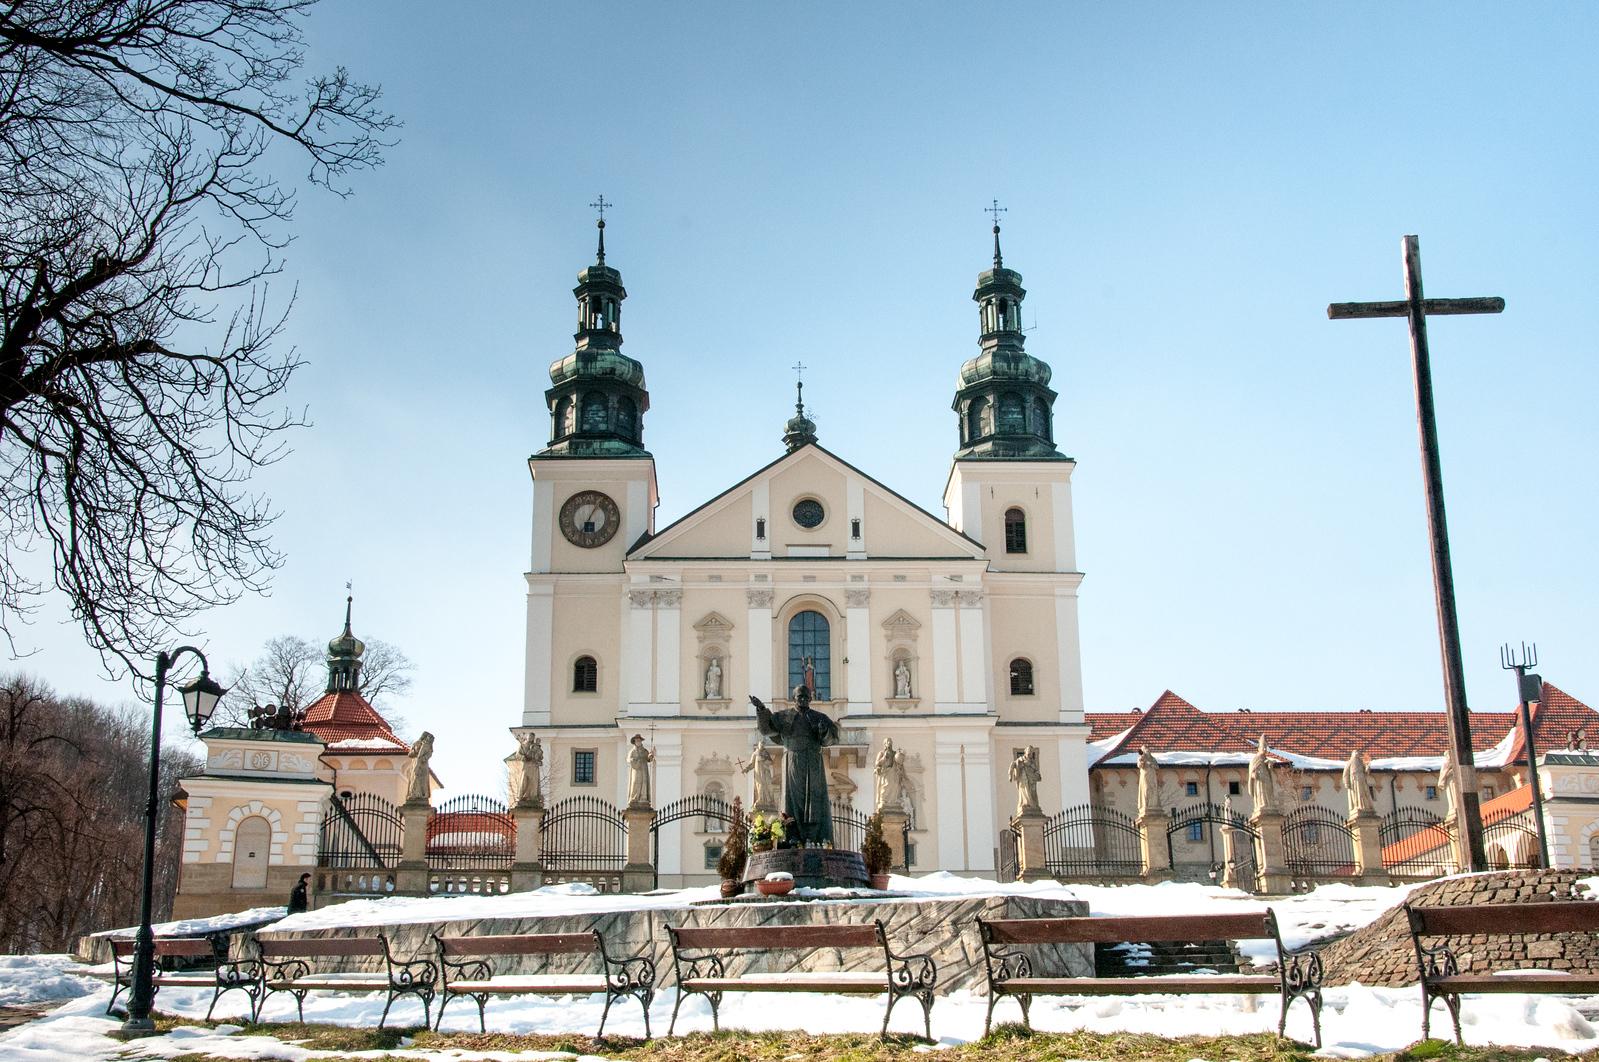 Kalwaria Zebrzydowska UNESCO World Heritage Site, Poland